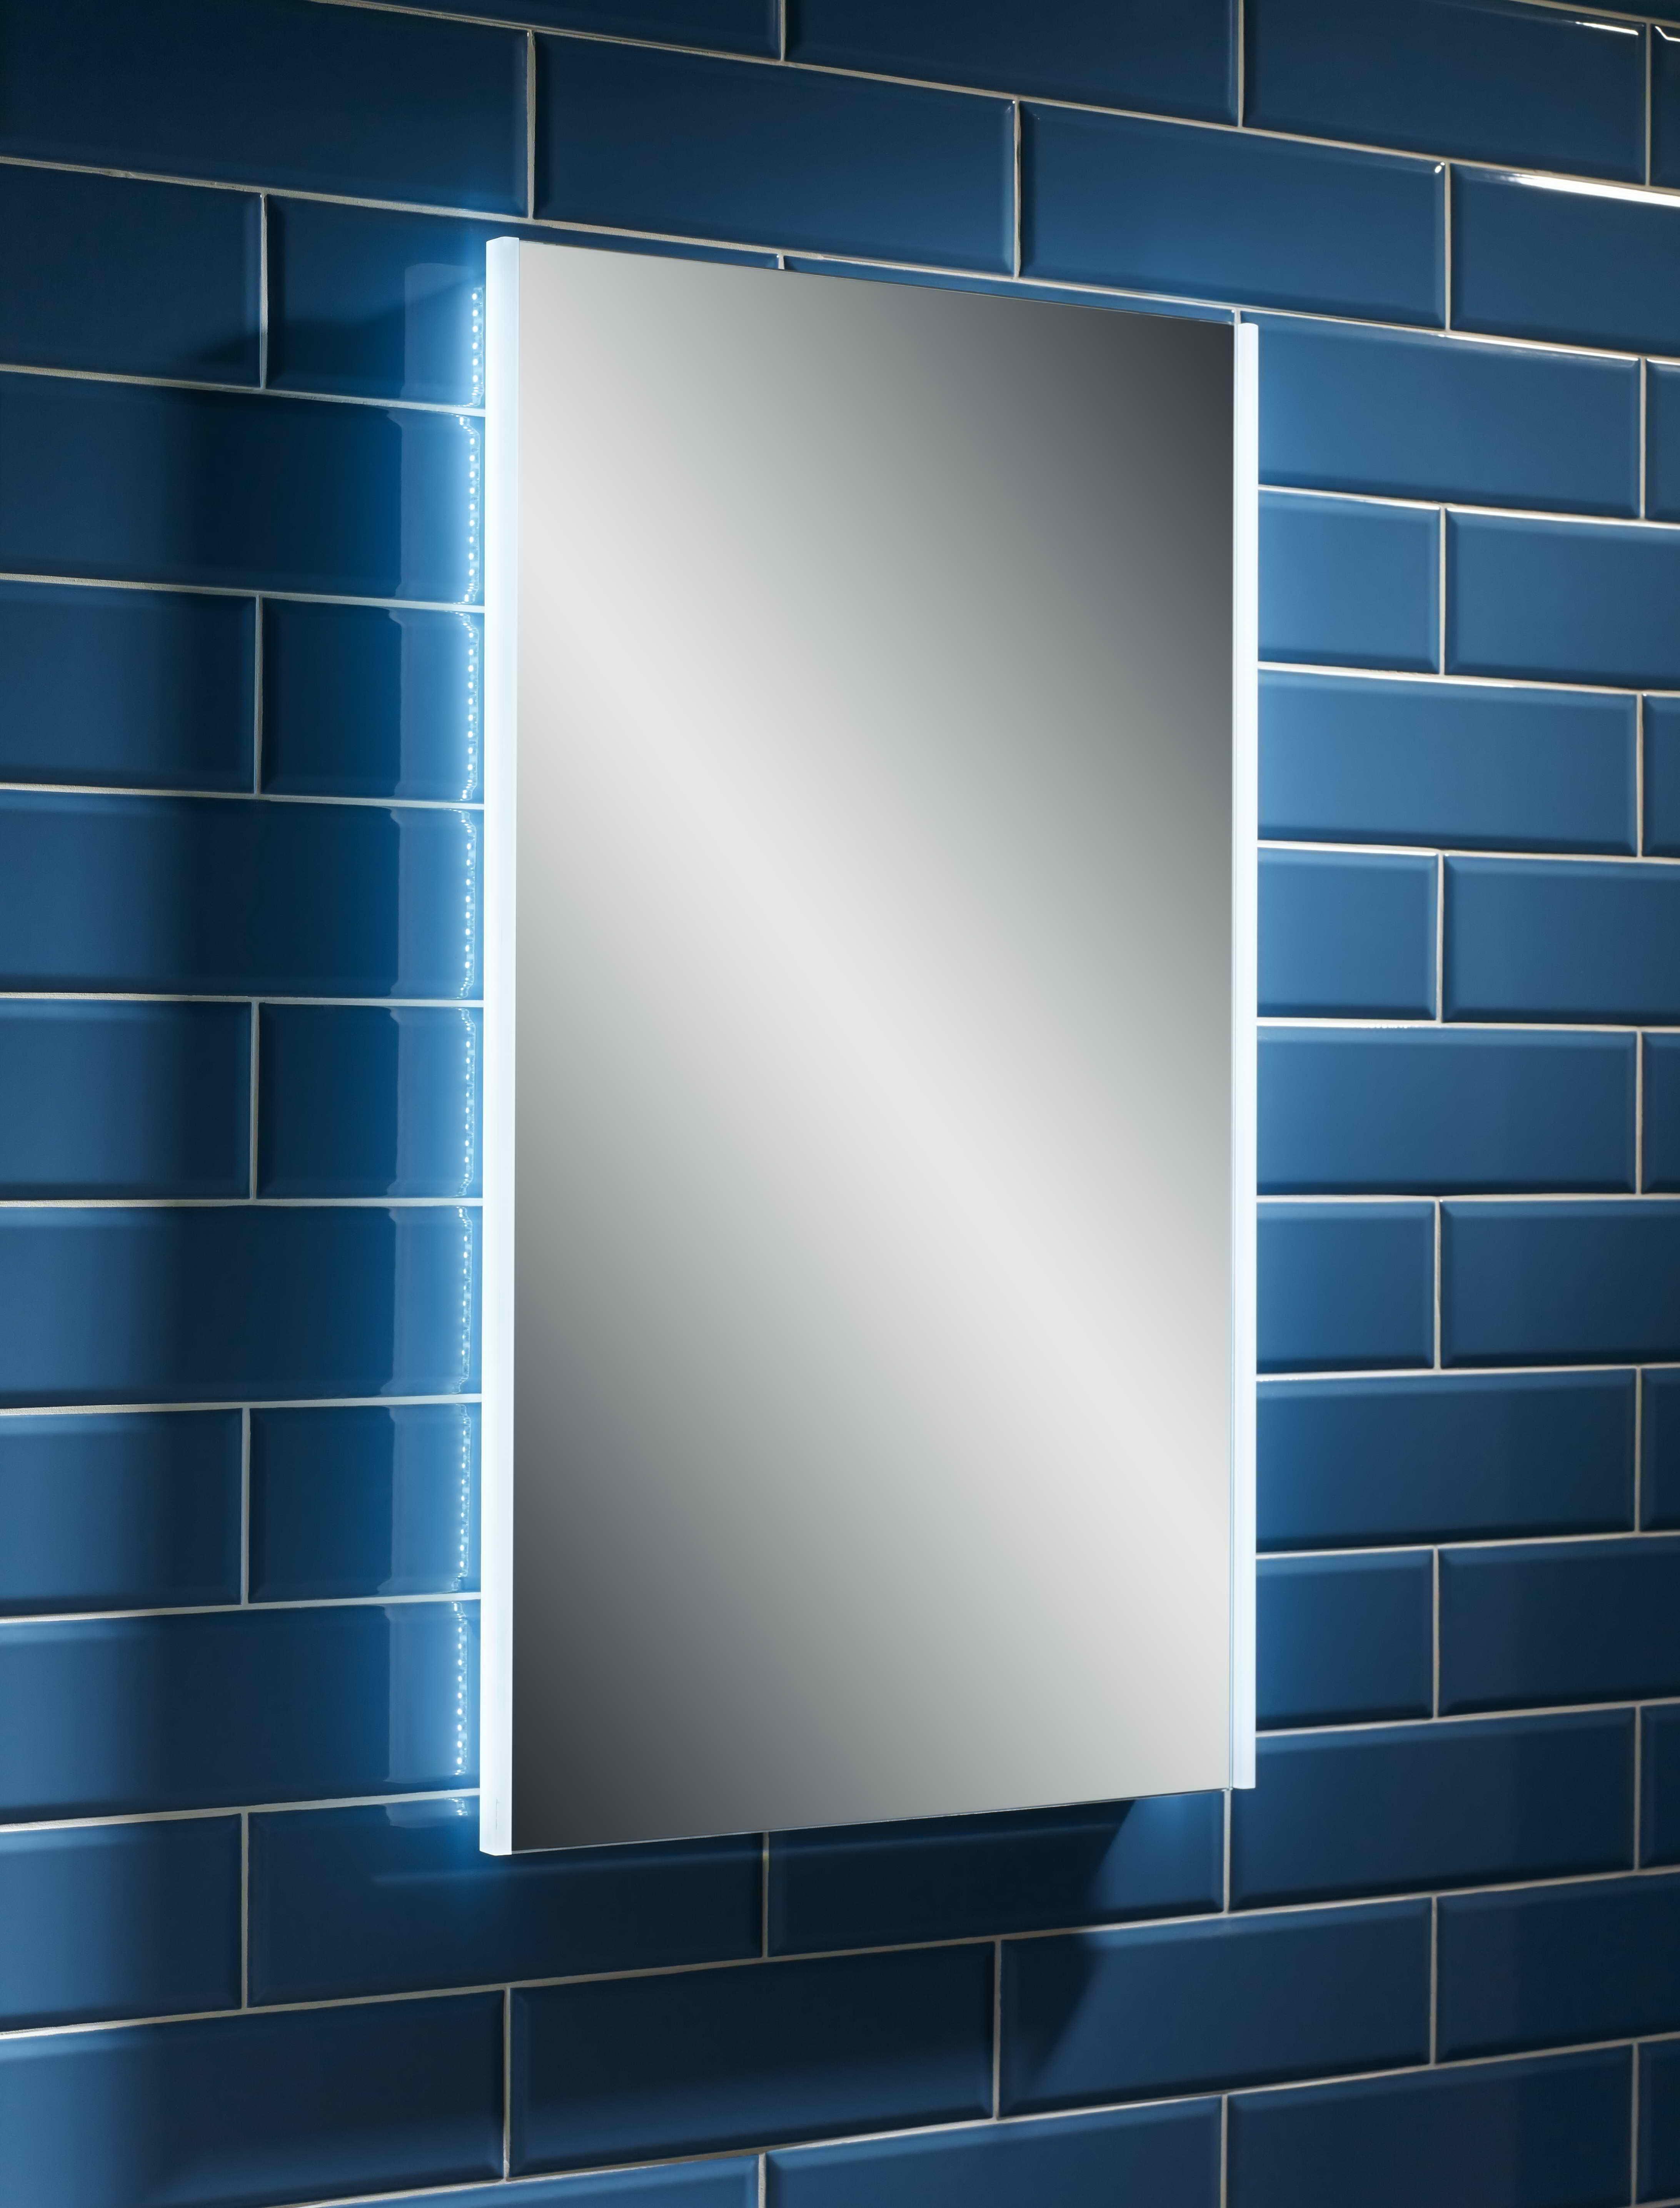 Esk 500 x 700 led mirror bath giant for Mirror 700 x 700